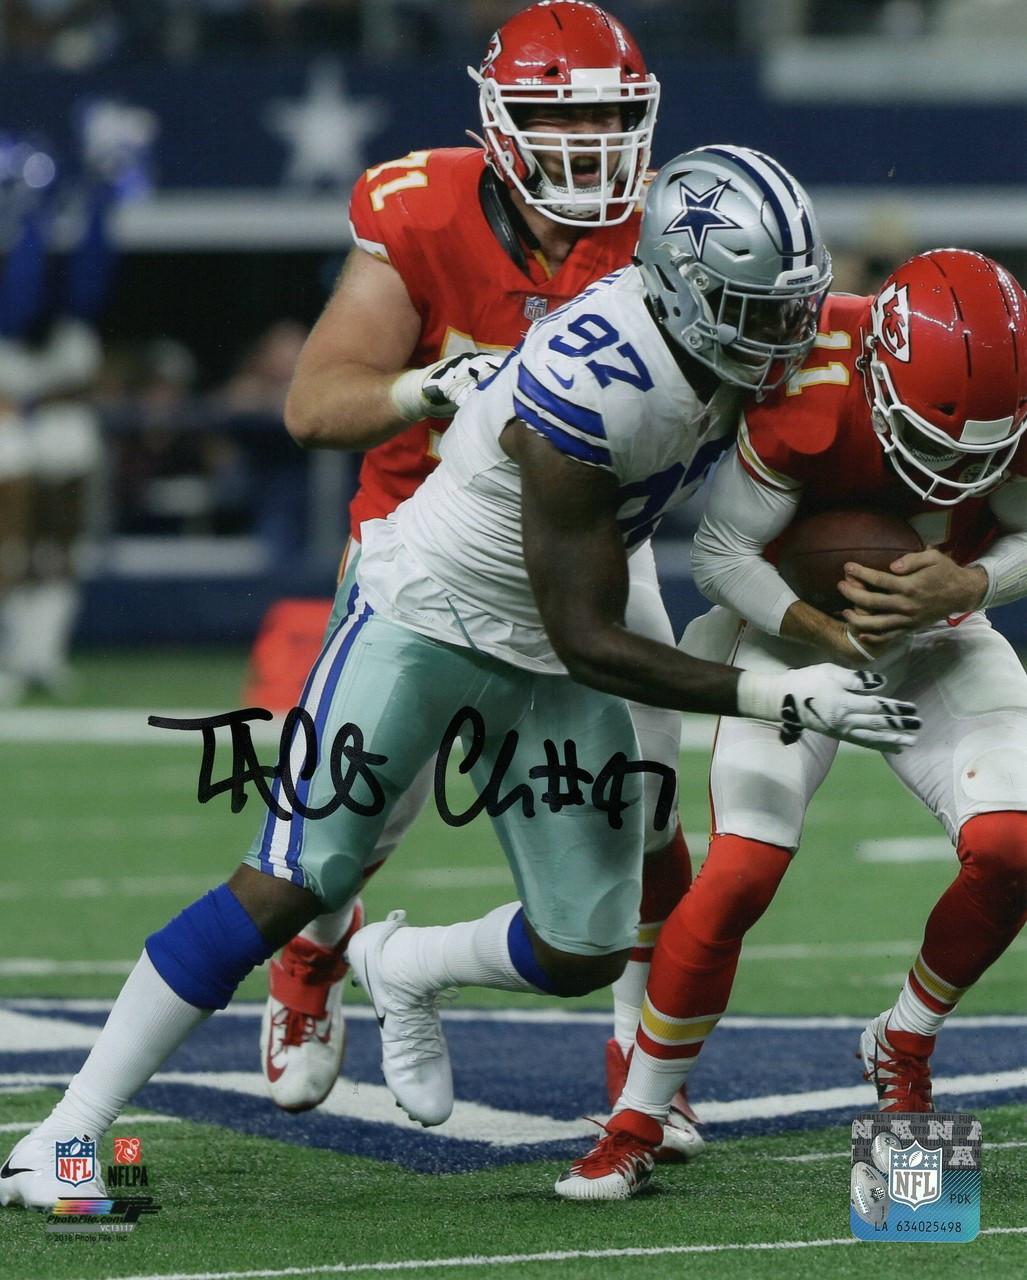 33135b55d01 Taco Charlton Dallas Cowboys 16-1 16x20 Autographed Photo - Certified  Authentic